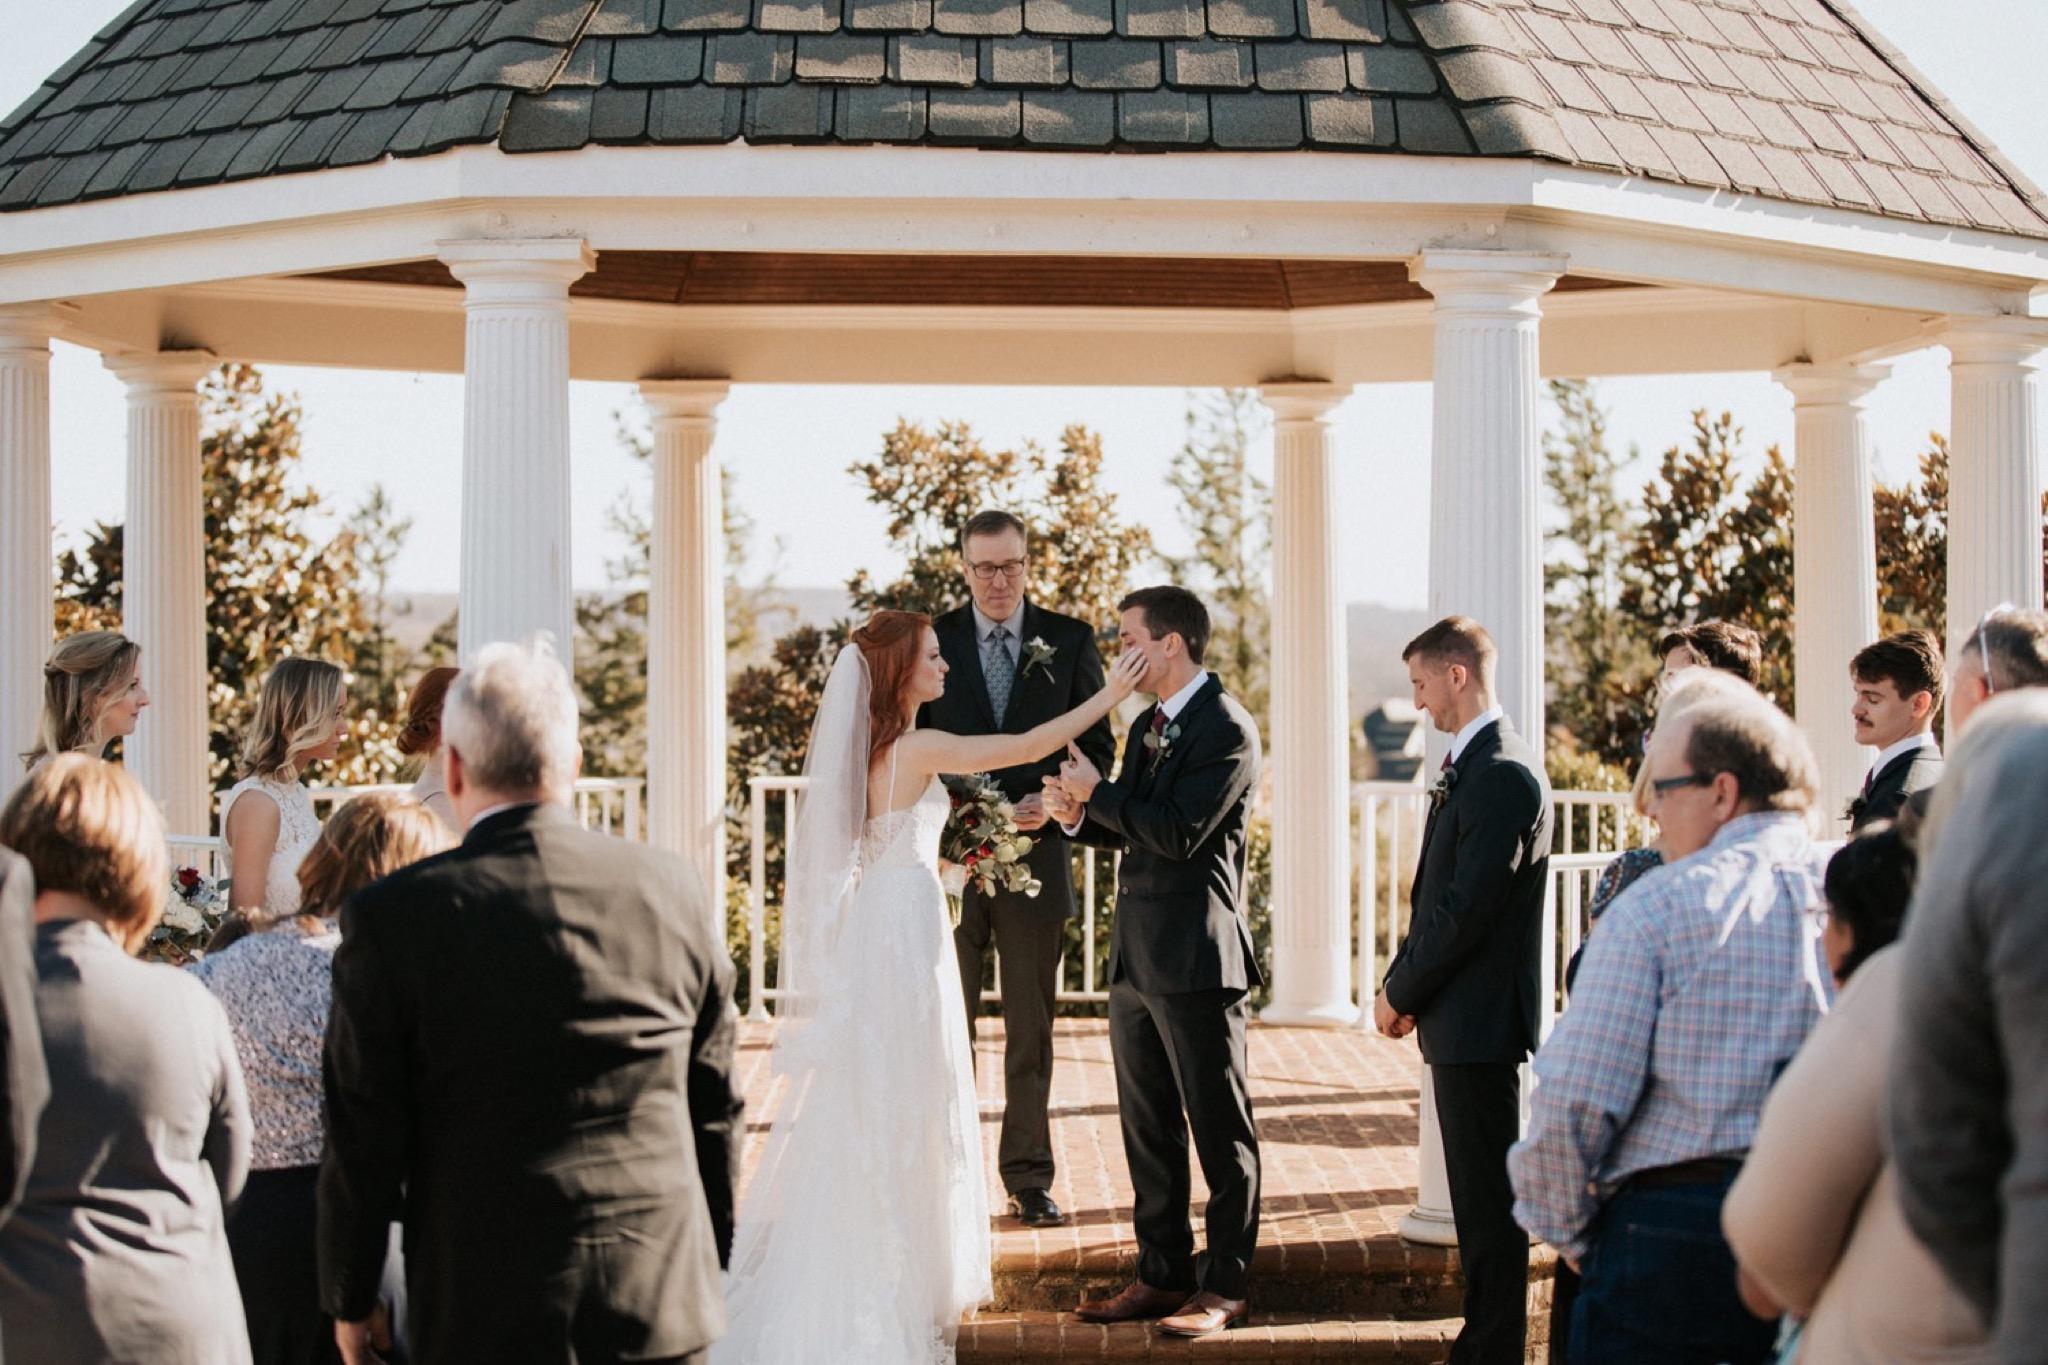 45_West Manor Estate Weddings - Pat Cori Photography-96_Ceremony_VirginiaWeddingPhotographer_PatCoriPhotography_WestManorEstate_Wedding.jpg